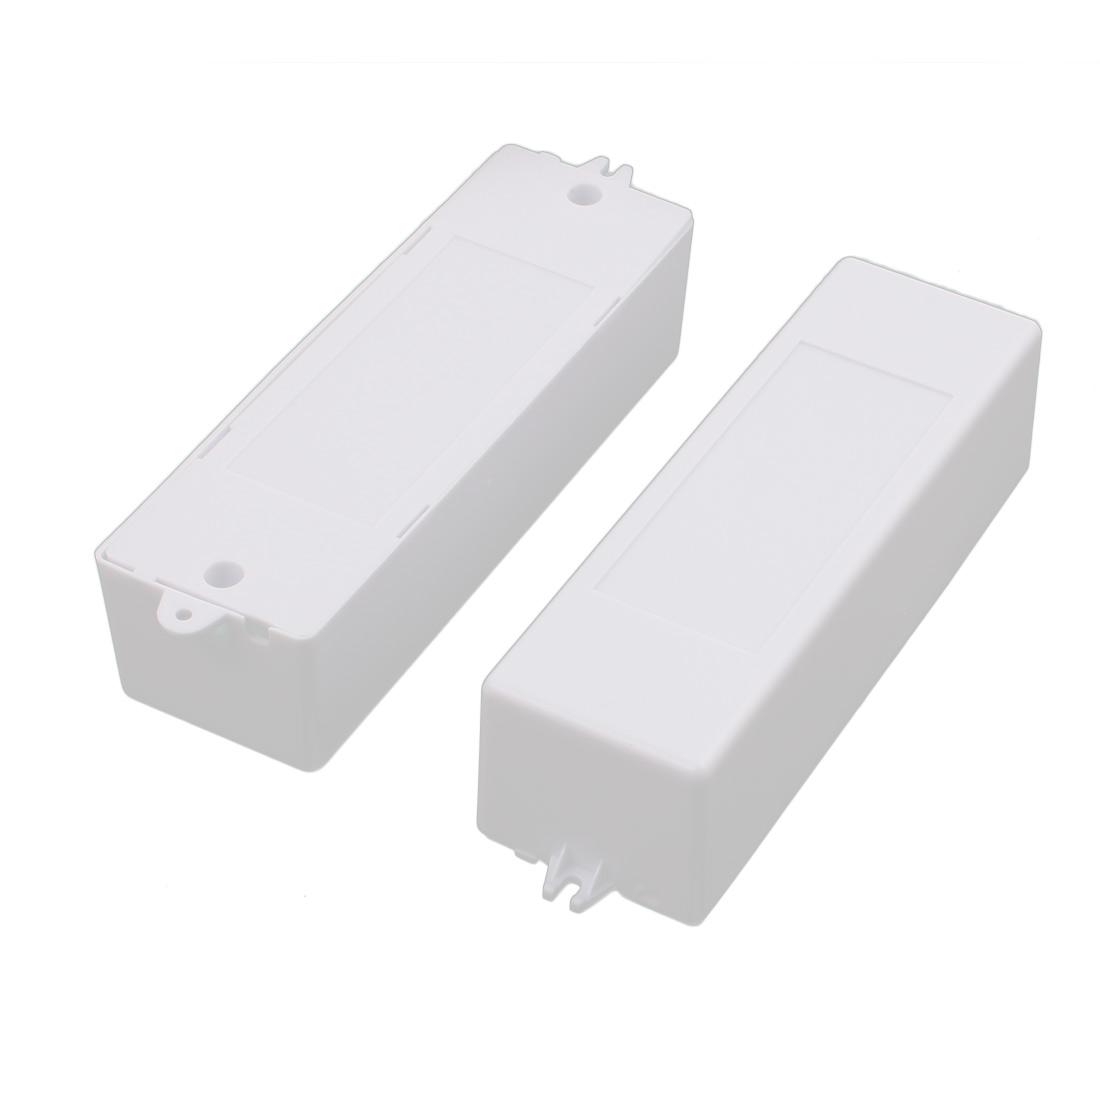 2Pcs XL168 157x46x37mm PC Flame Retardant Enclosure Junction Box for LED Driver